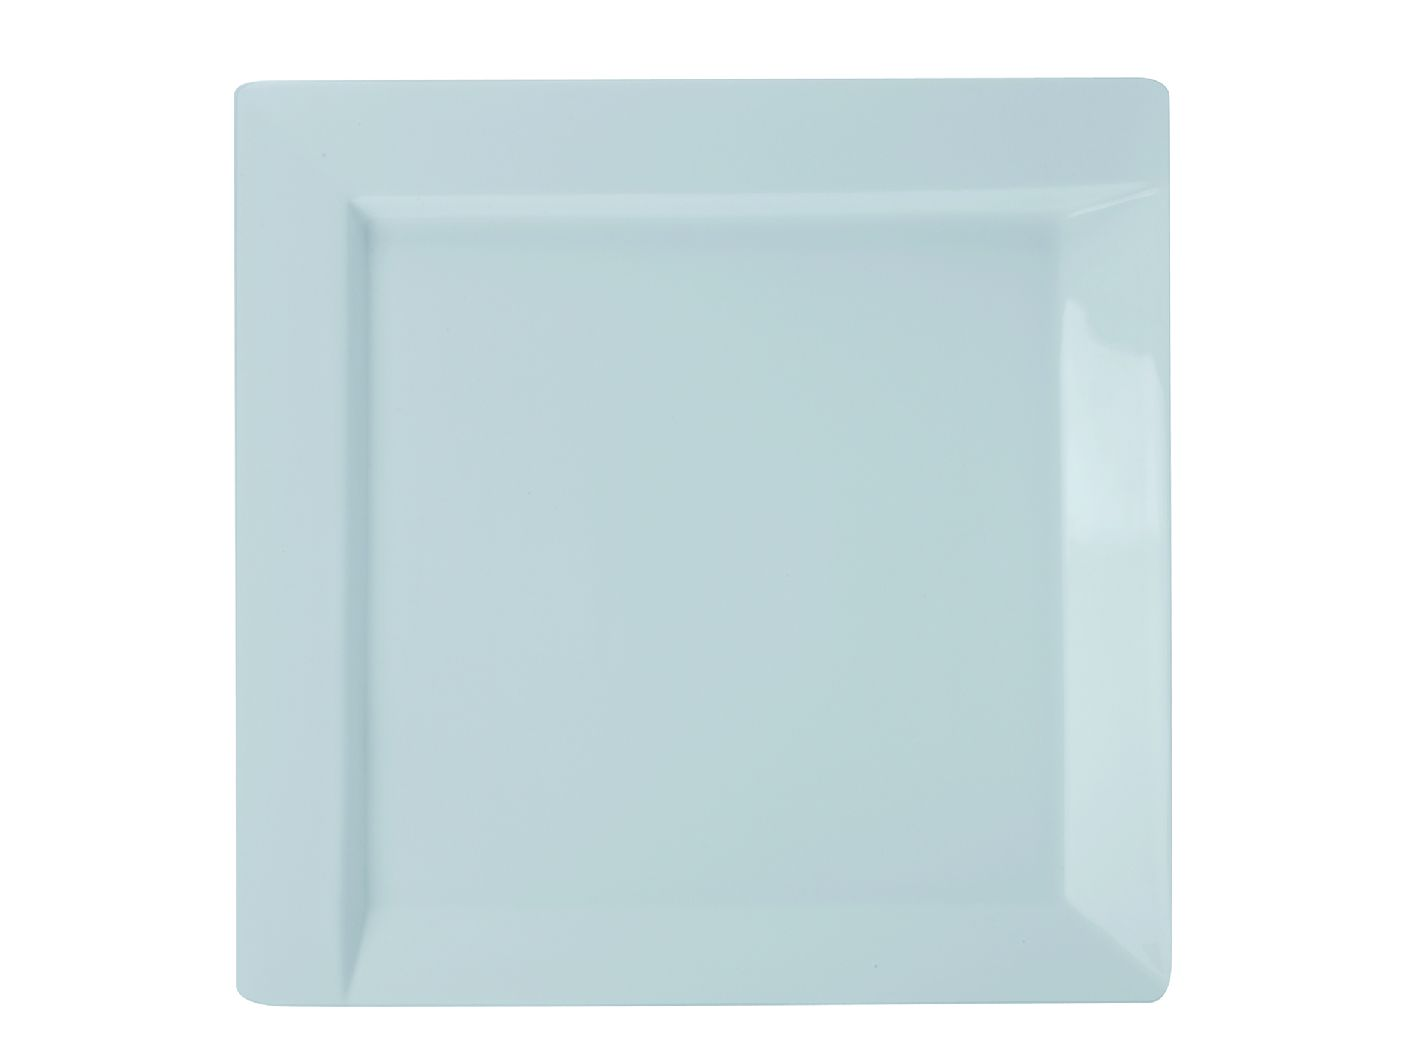 Porcelánový Jídelní talíř ZiiZ 26,5 cm - Maxwell&Williams